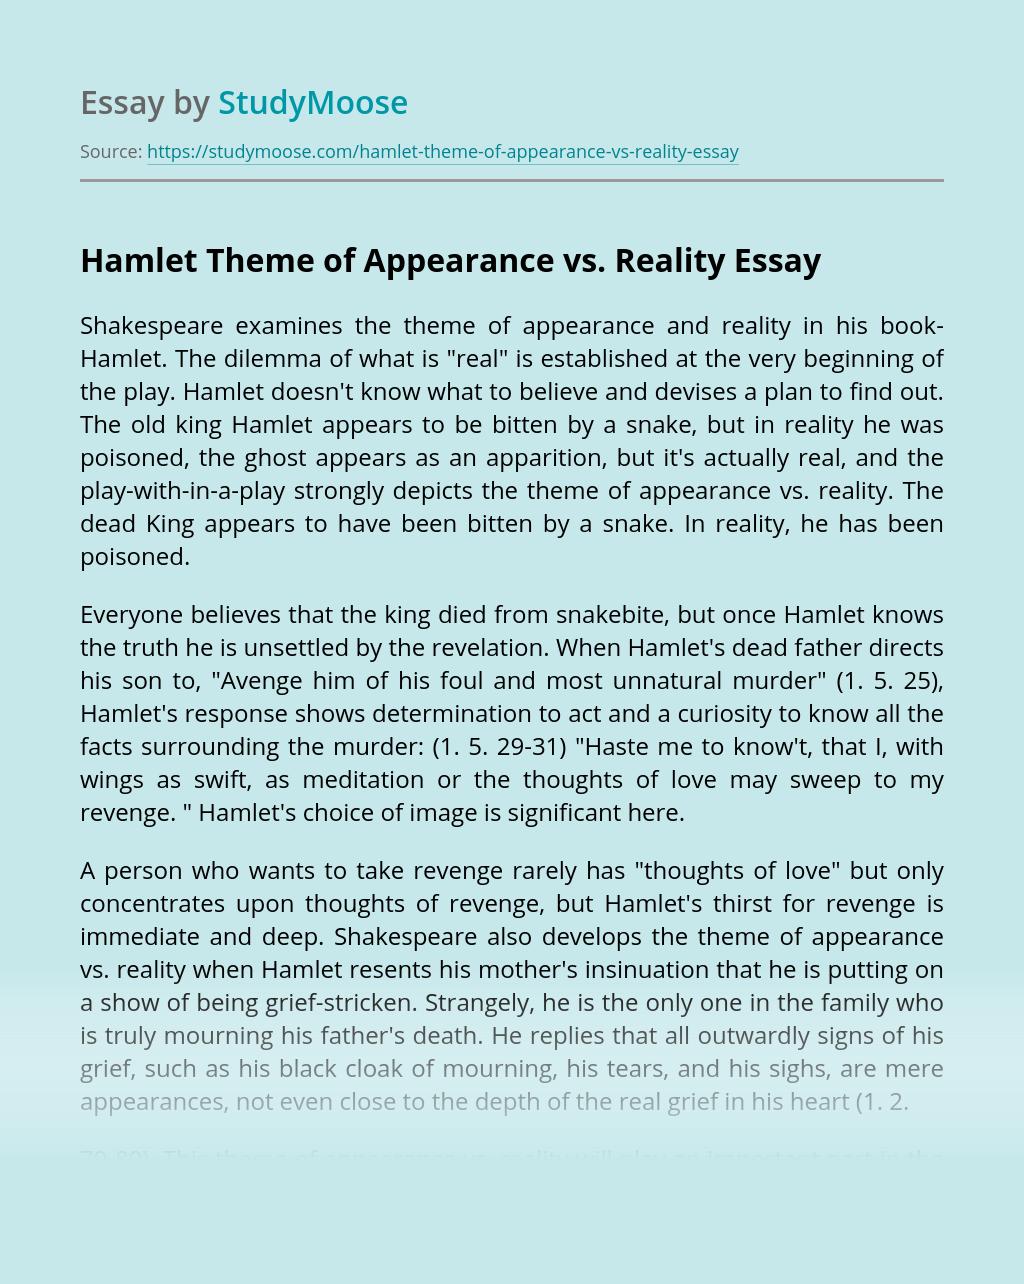 Hamlet Theme of Appearance vs. Reality